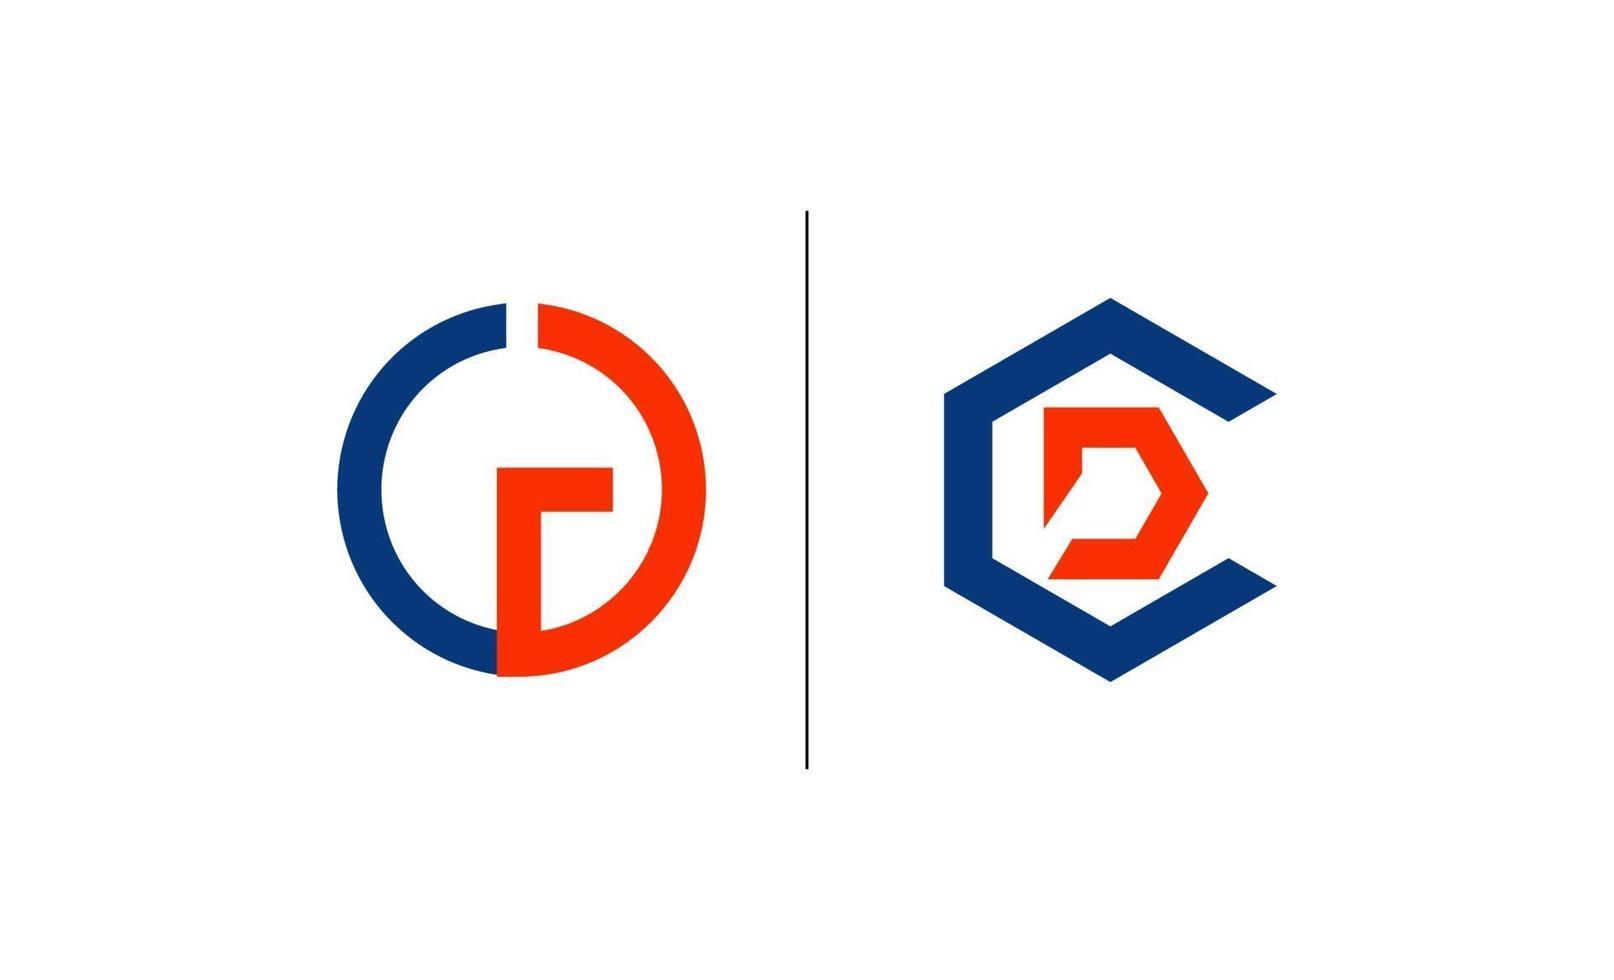 anfänglicher CD-Logo-Vorlagenentwurfsvektor vektor